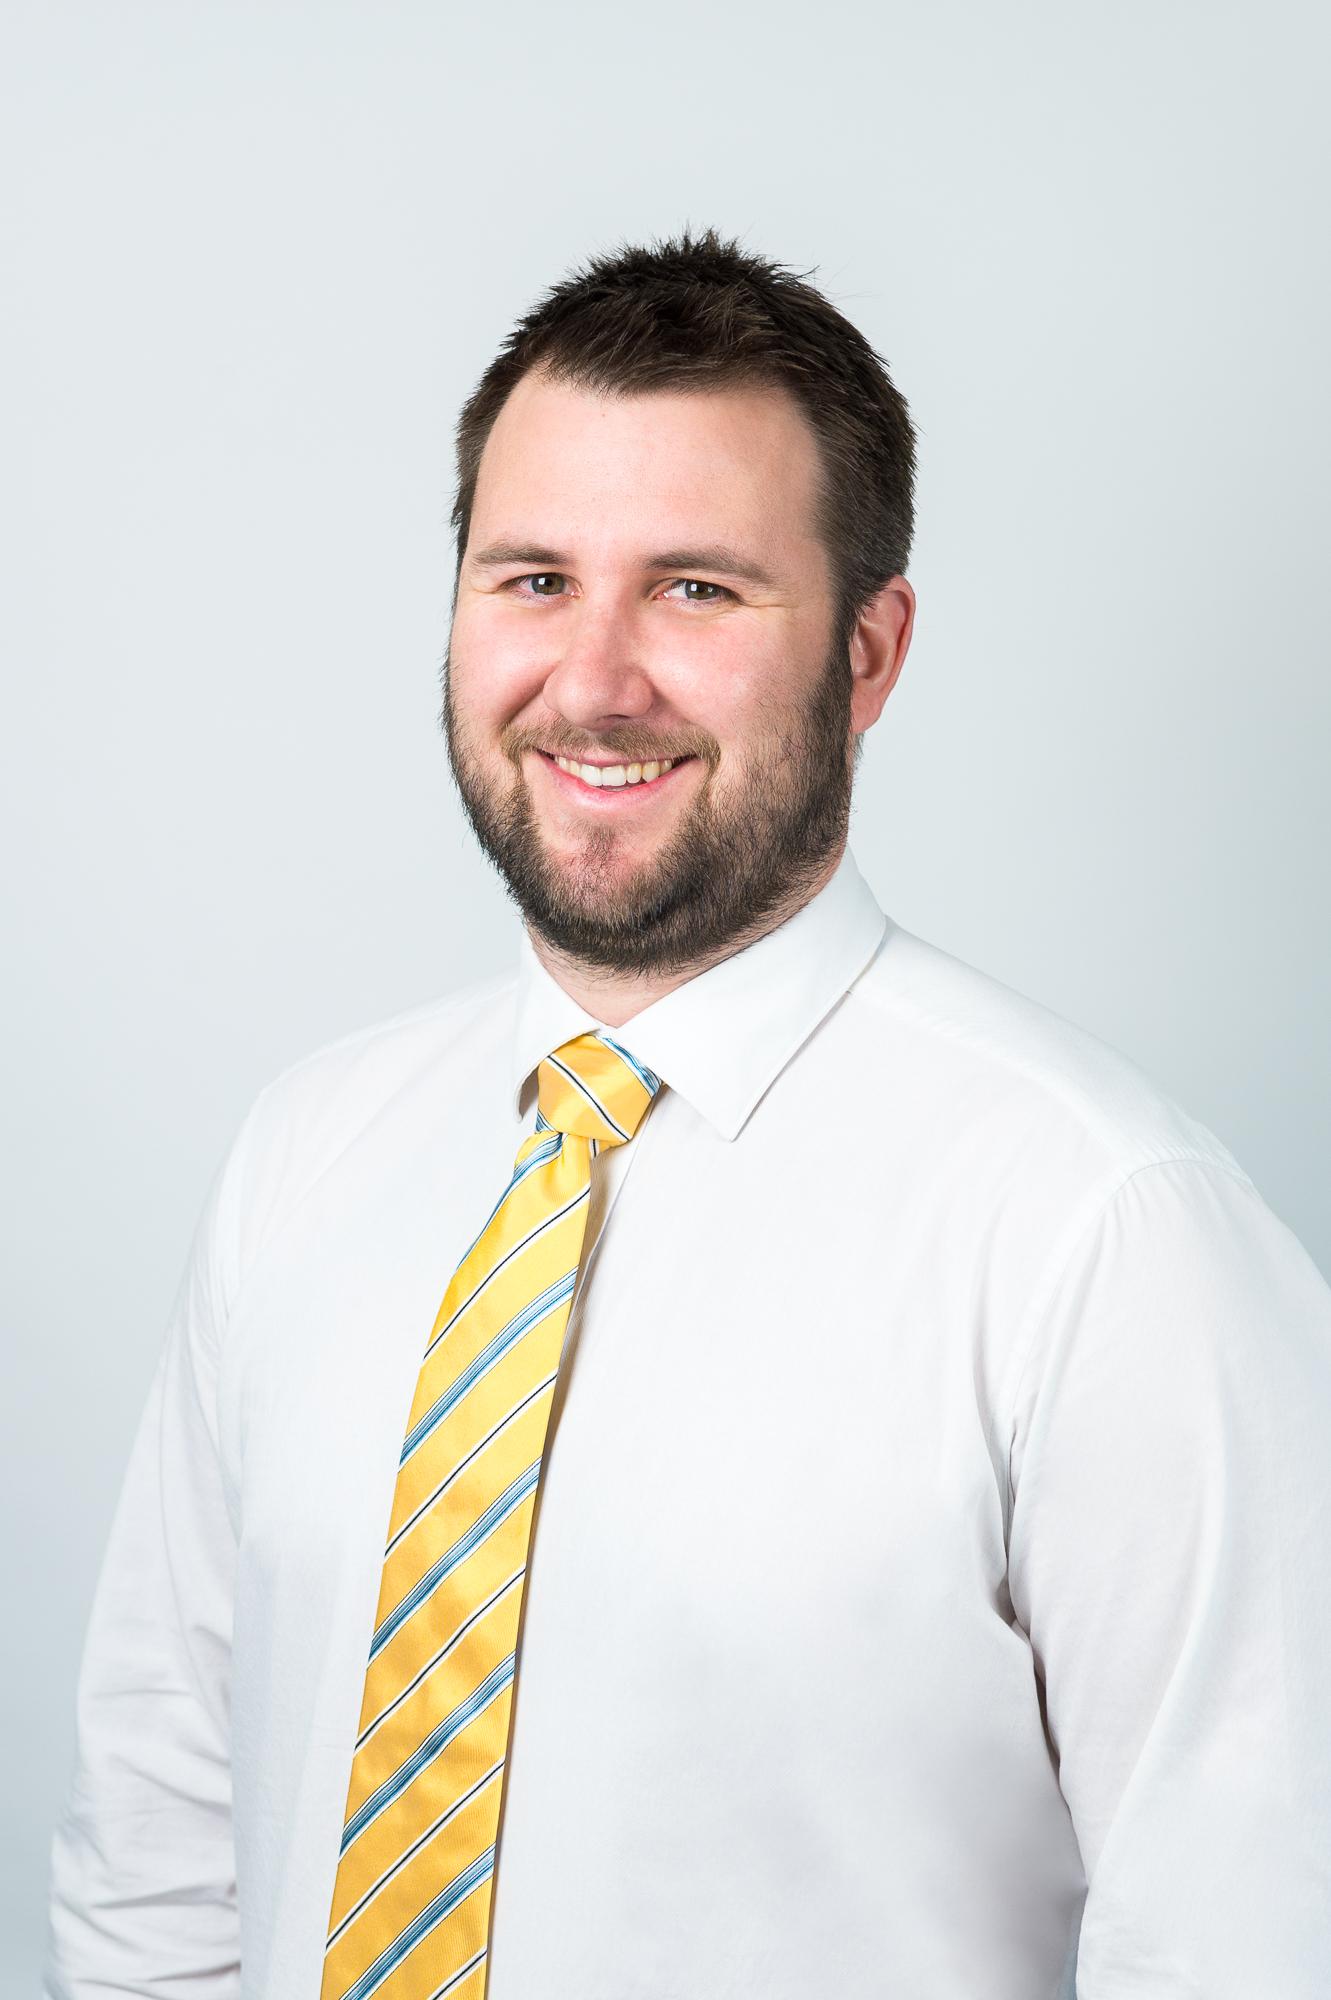 Paul Grogan, - Associate Director